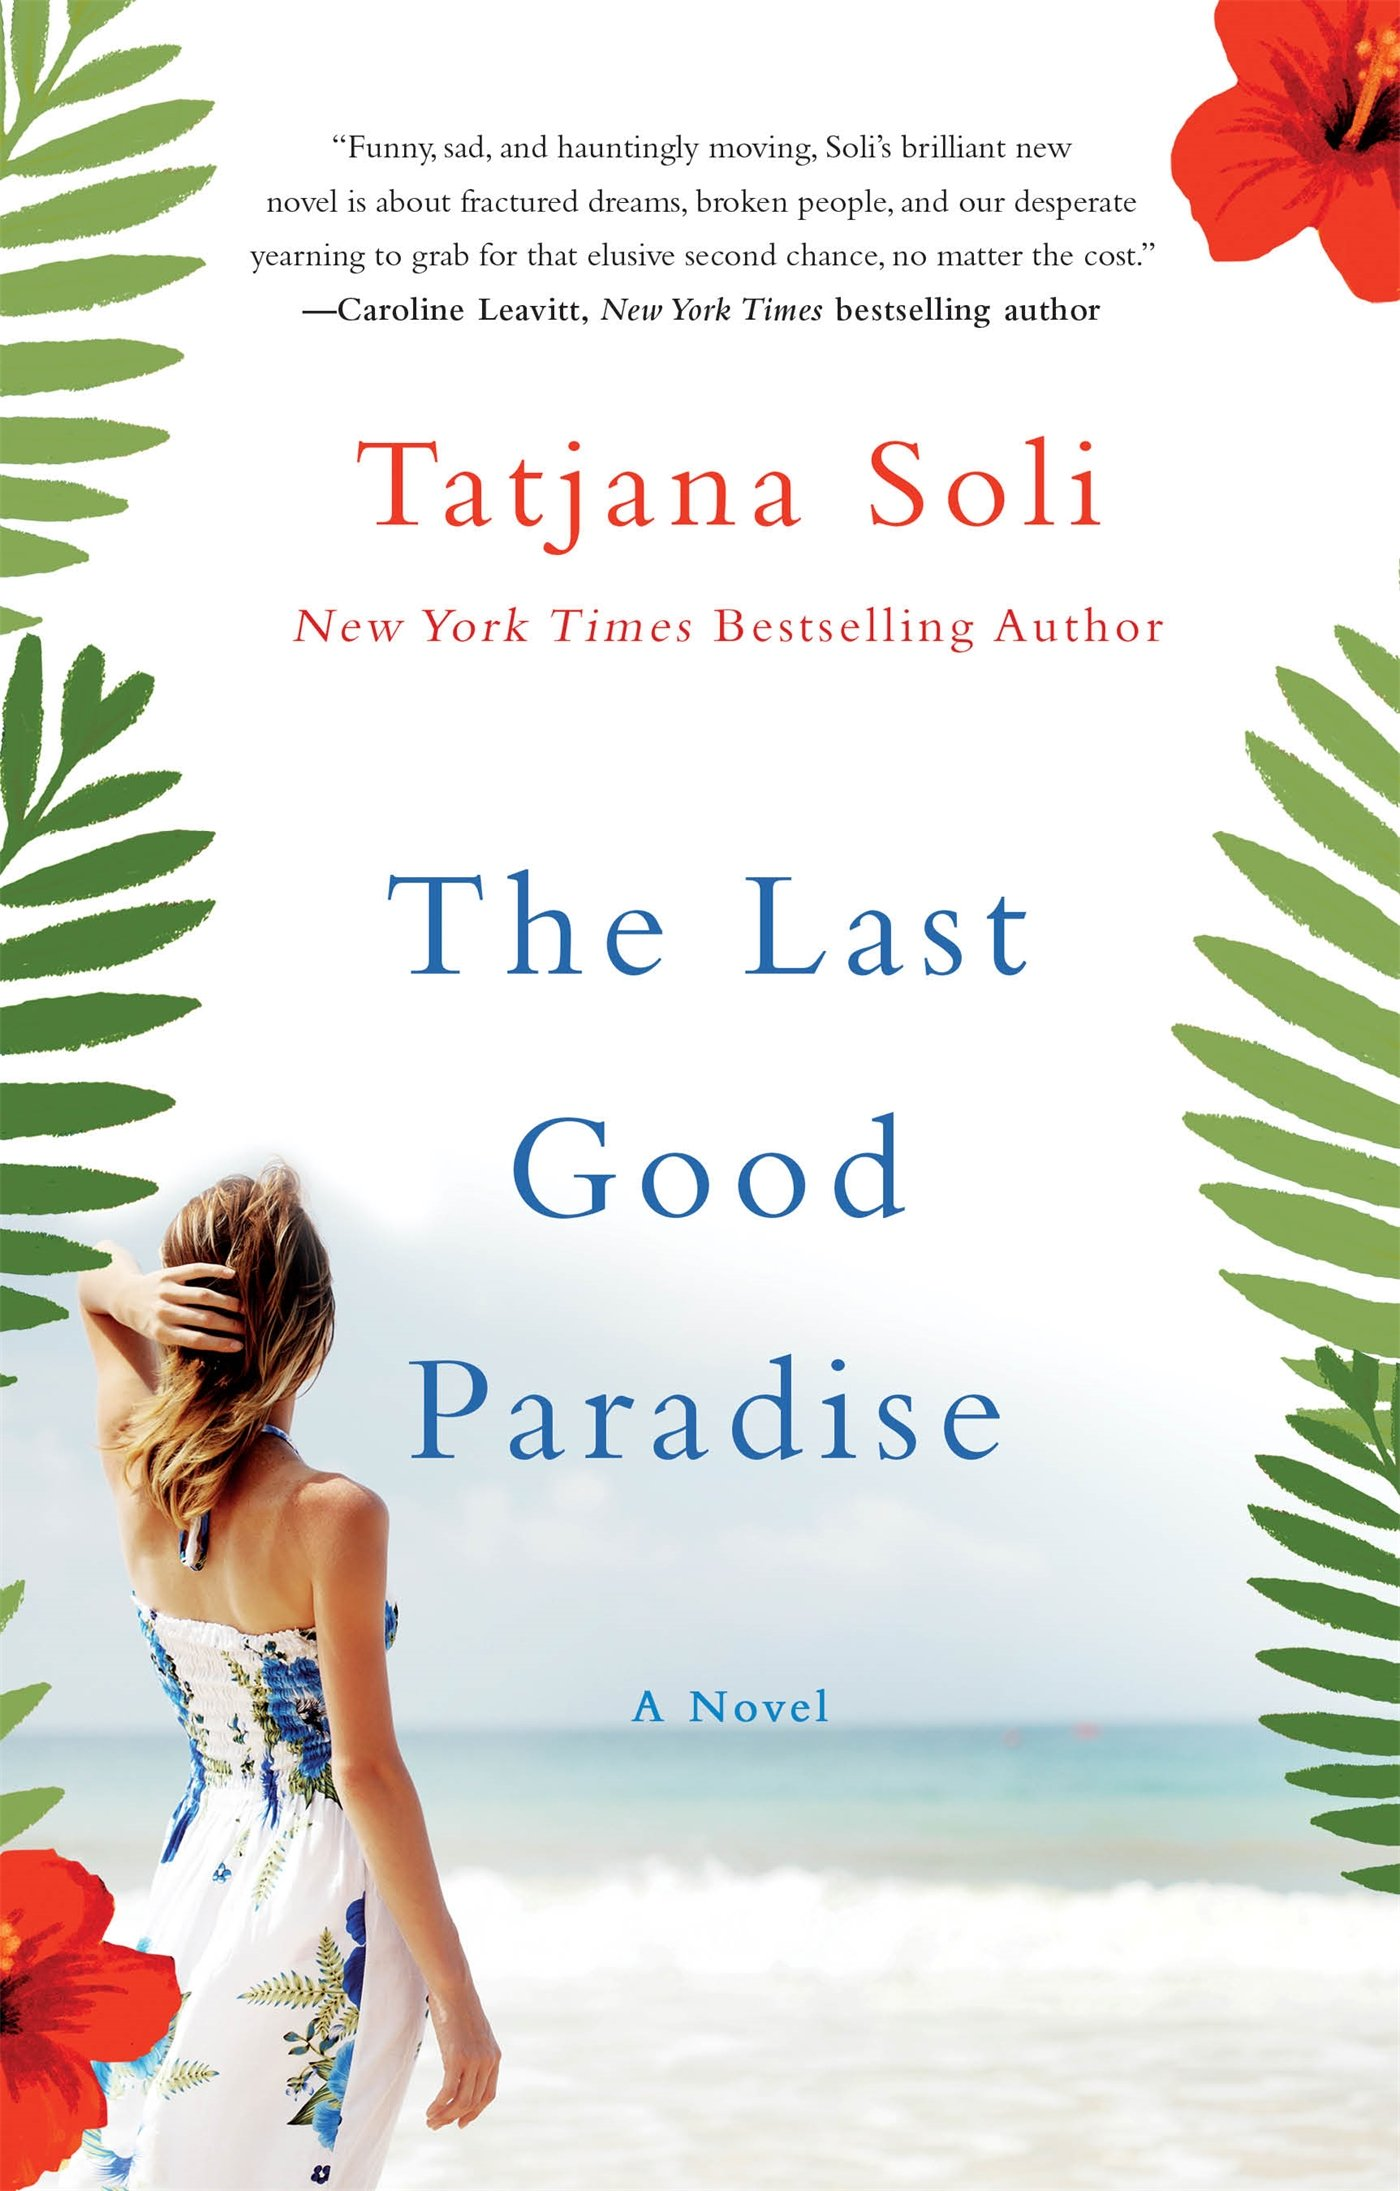 The Last Good Paradise: A Novel: Tatjana Soli: 9781250095015: Amazon:  Books